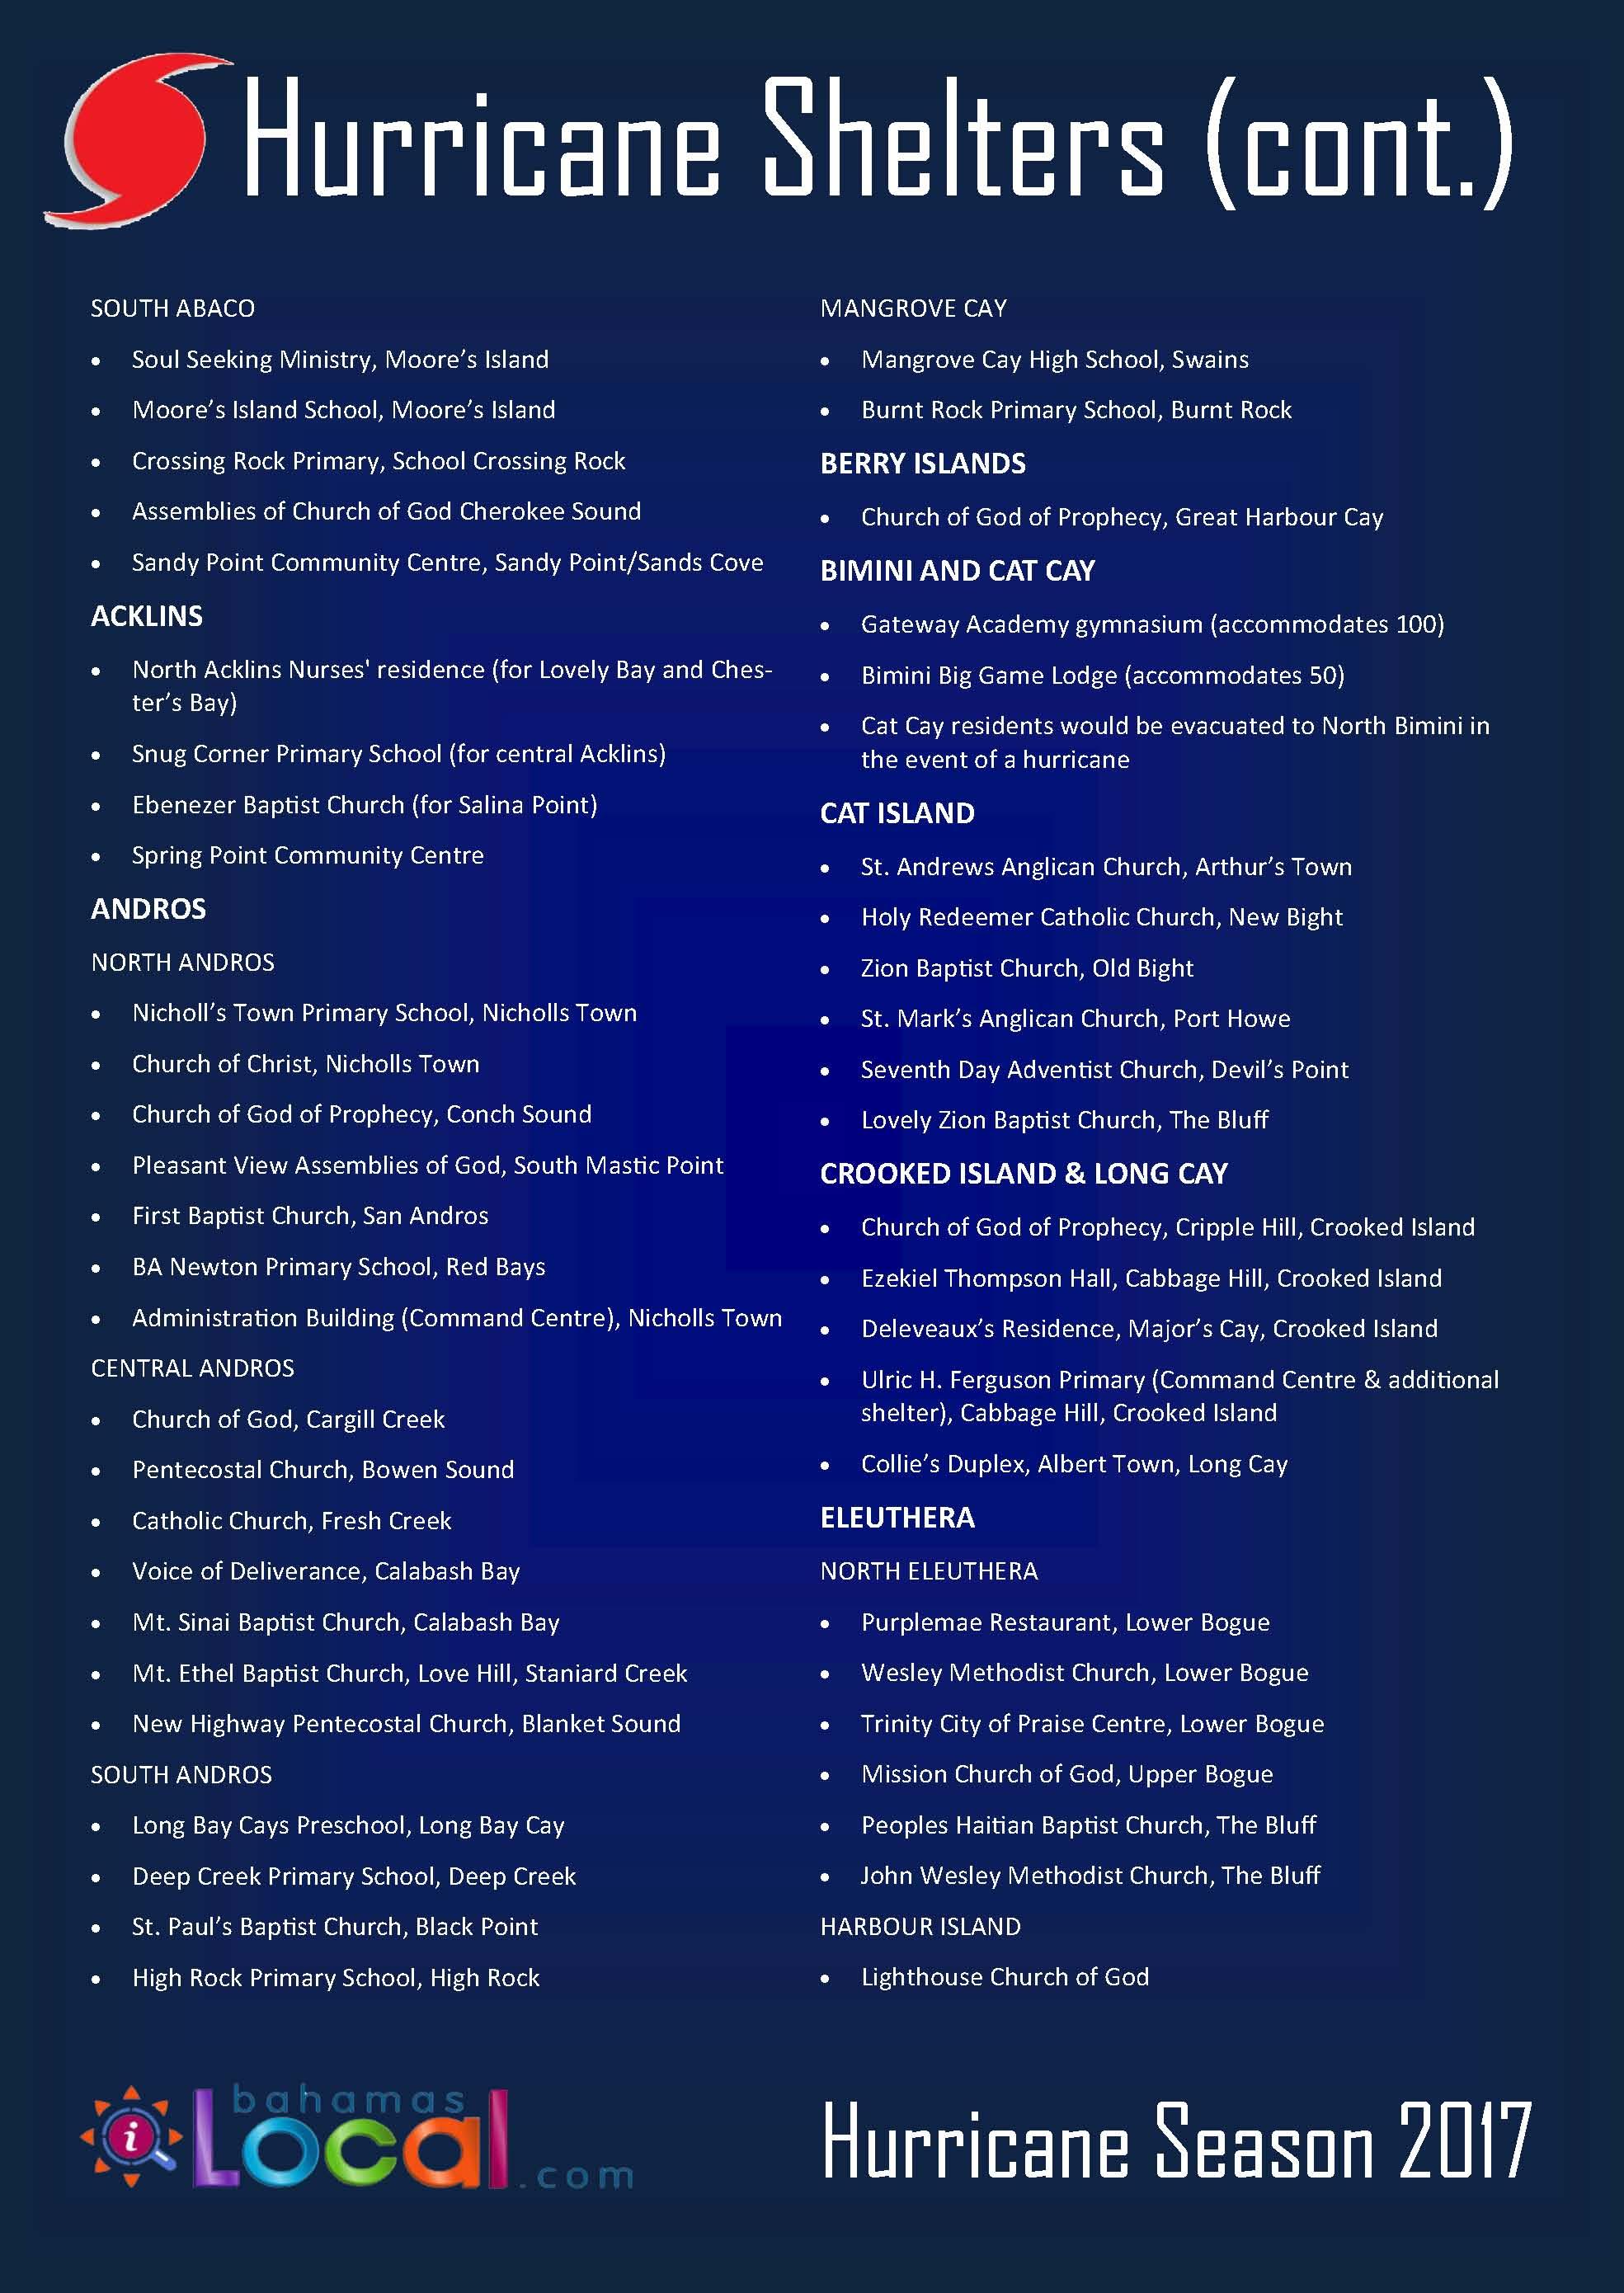 Shelters Page 2 | Hurricane Season 2017